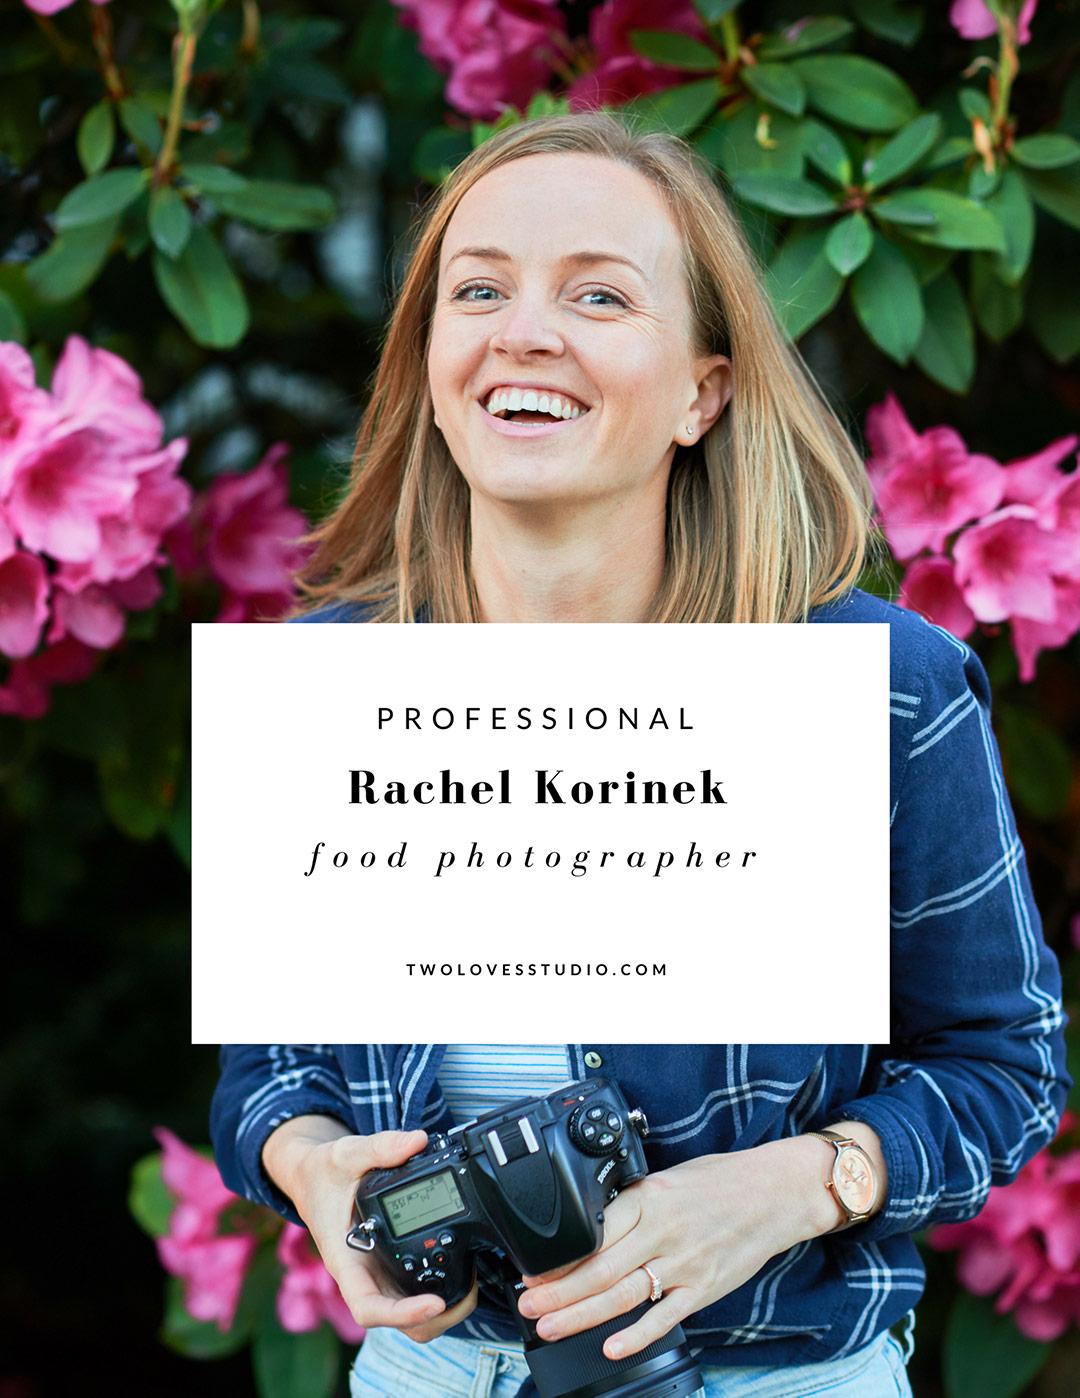 Rachel Korinek Professional Food Photographer